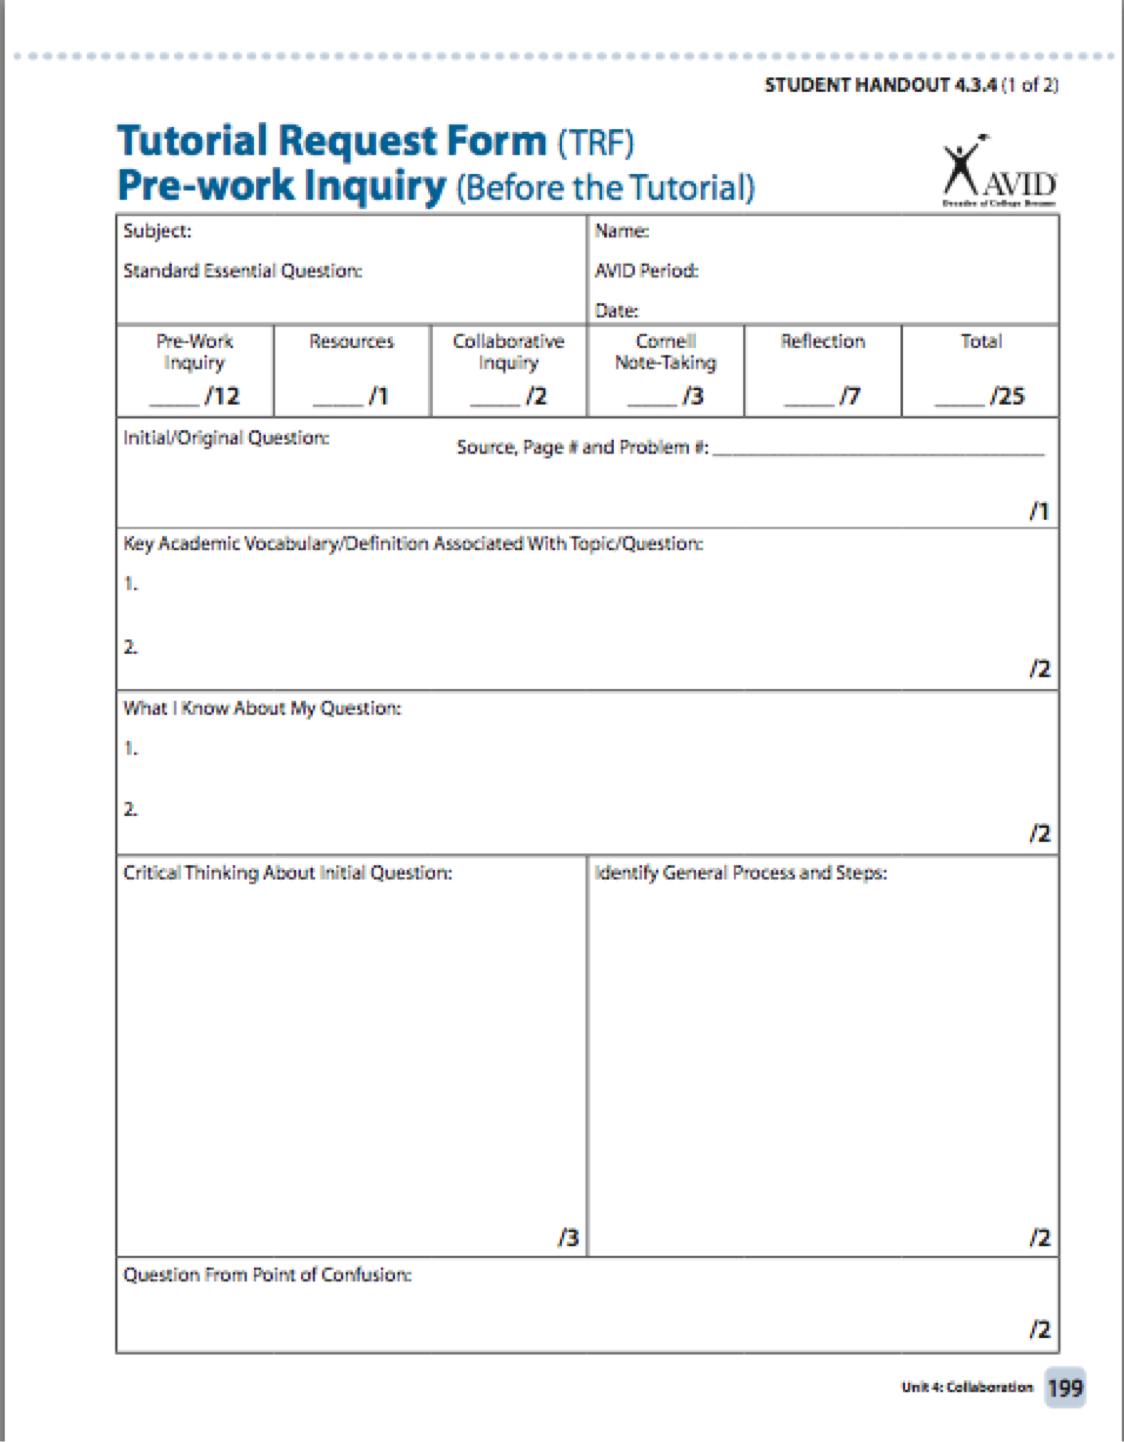 Refraction Worksheet Students